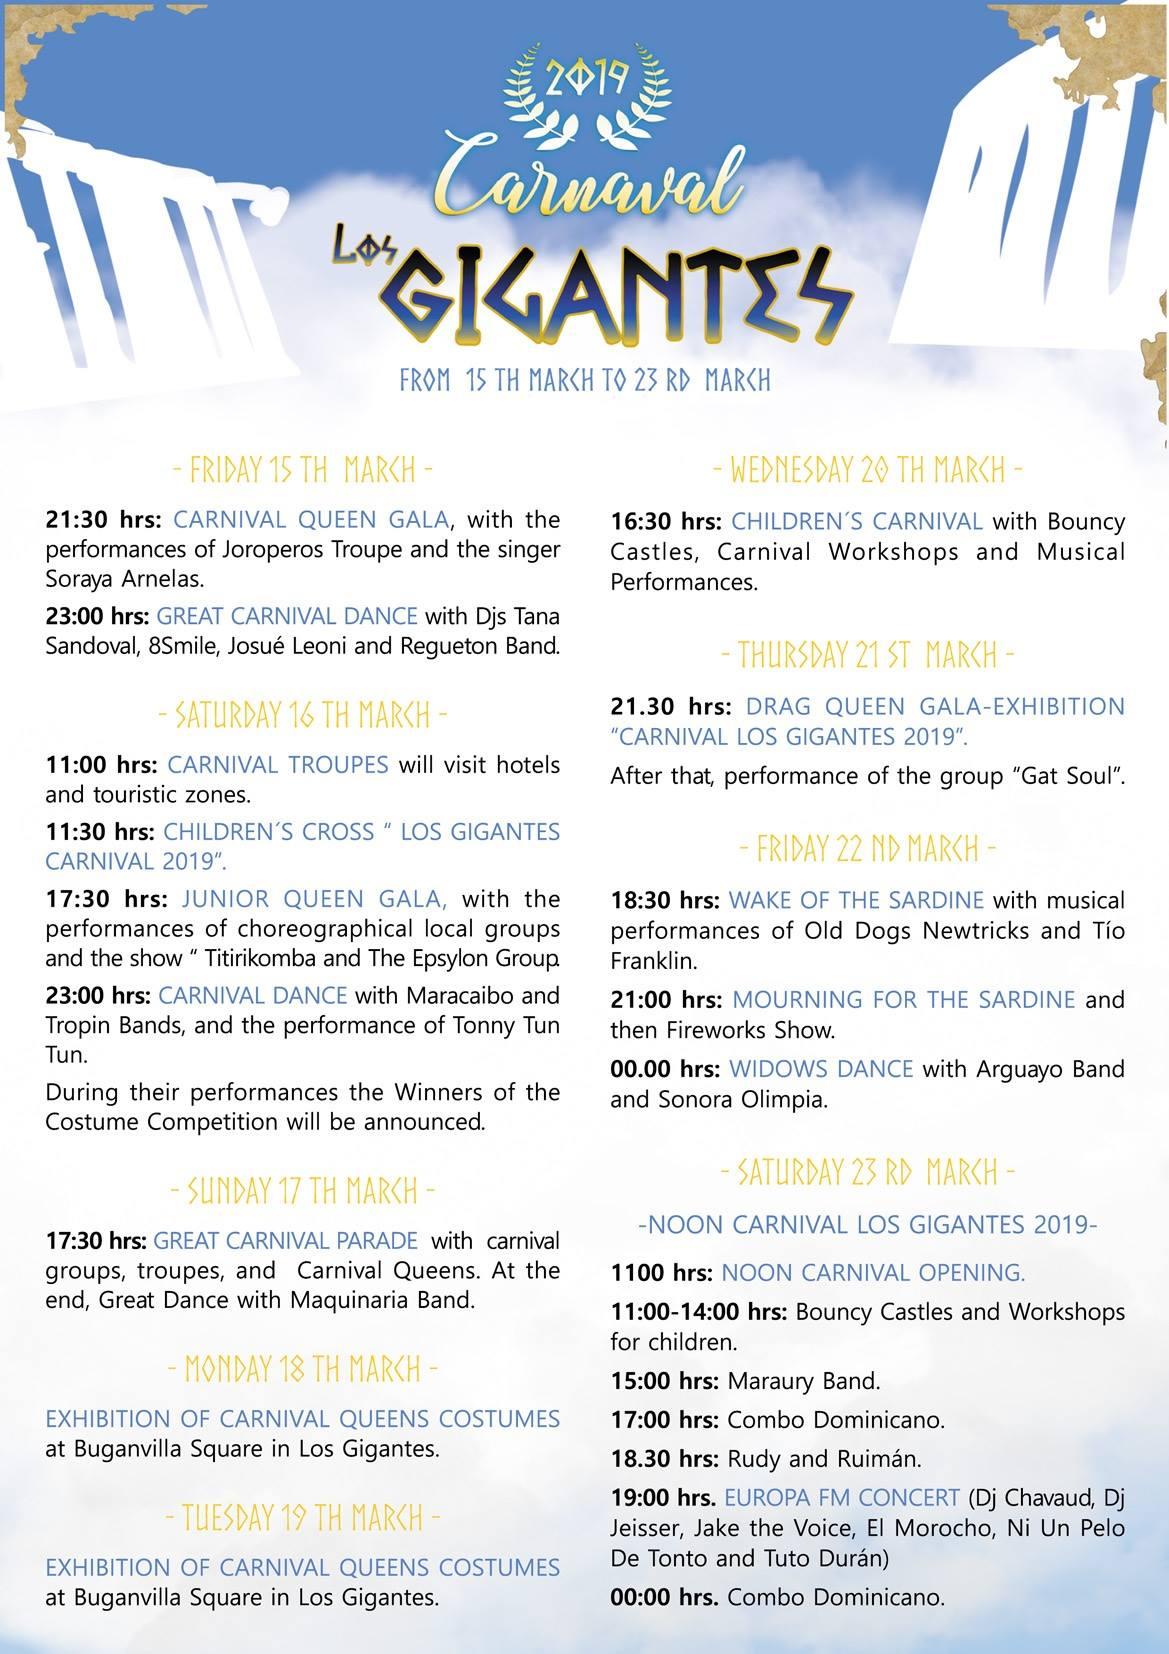 los-gigantes-carnival-2019-program